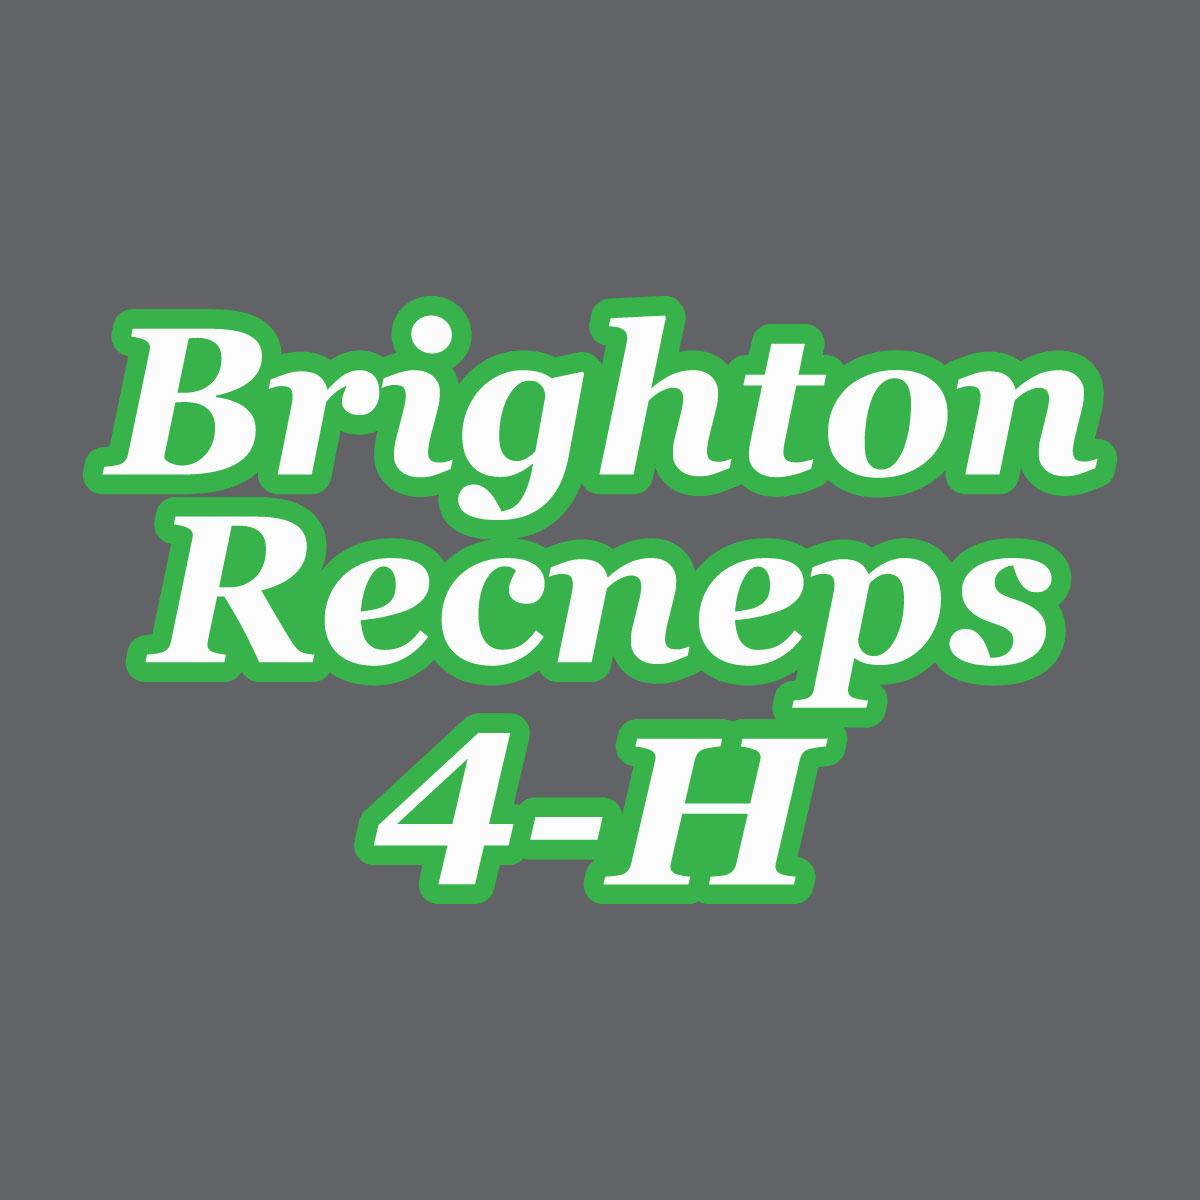 Brighton Recneps 4H